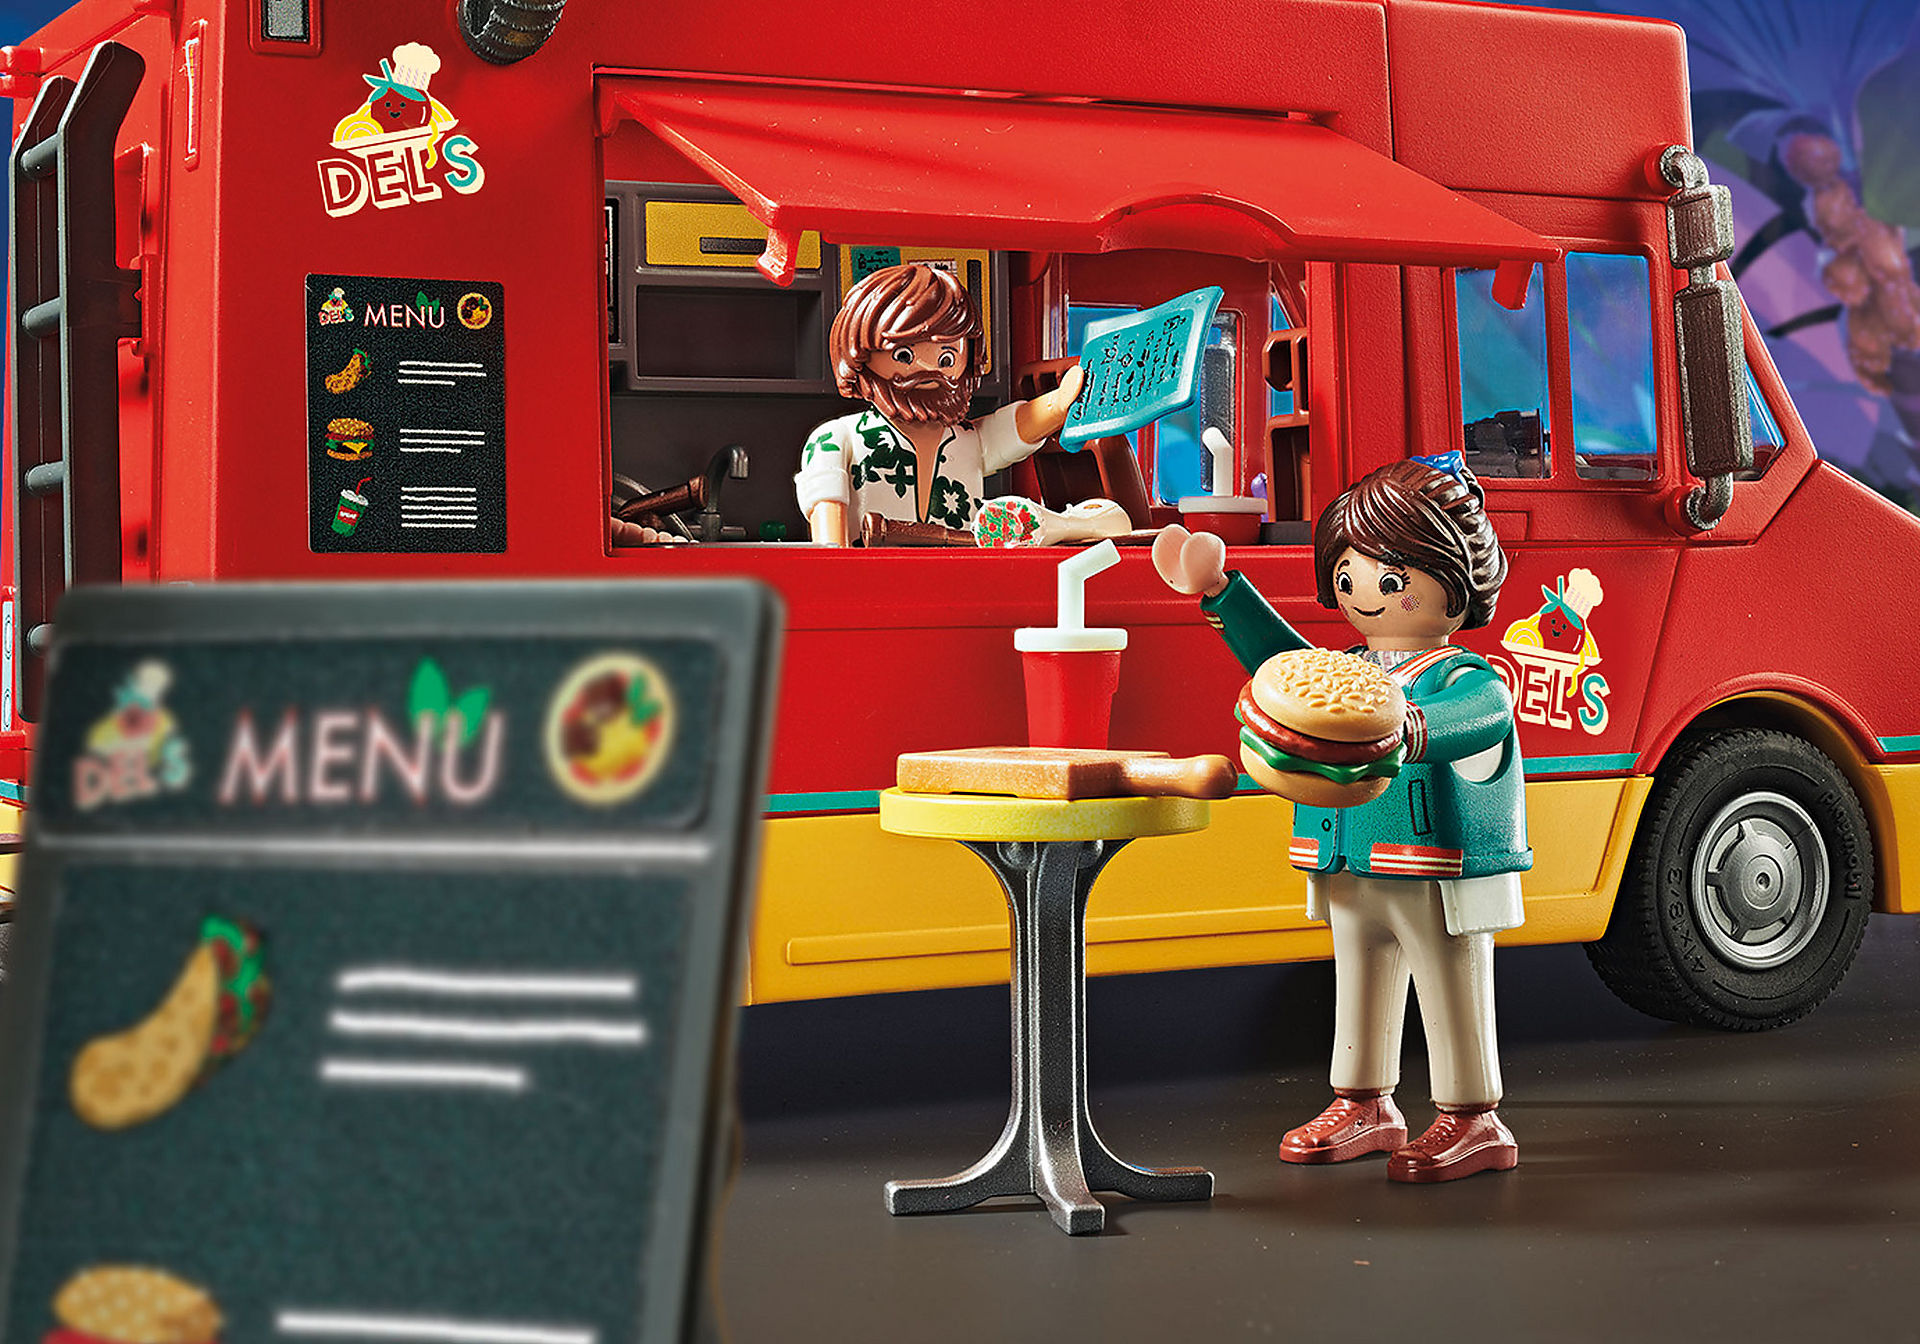 http://media.playmobil.com/i/playmobil/70075_product_extra2/PLAYMOBIL:THE MOVIE Del's Food Truck